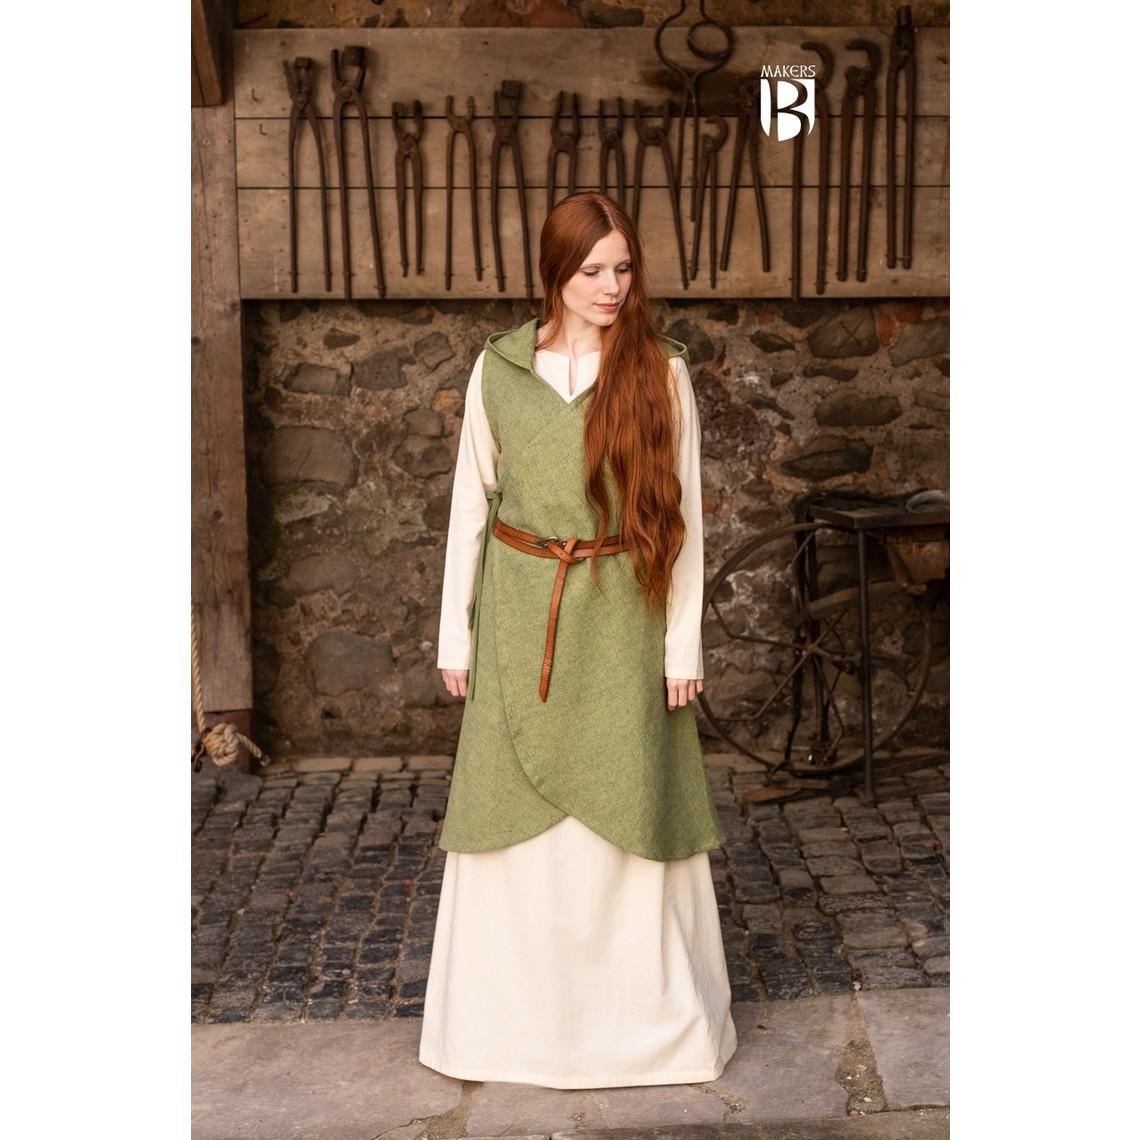 Burgschneider Vestido cruzado runa verde linden